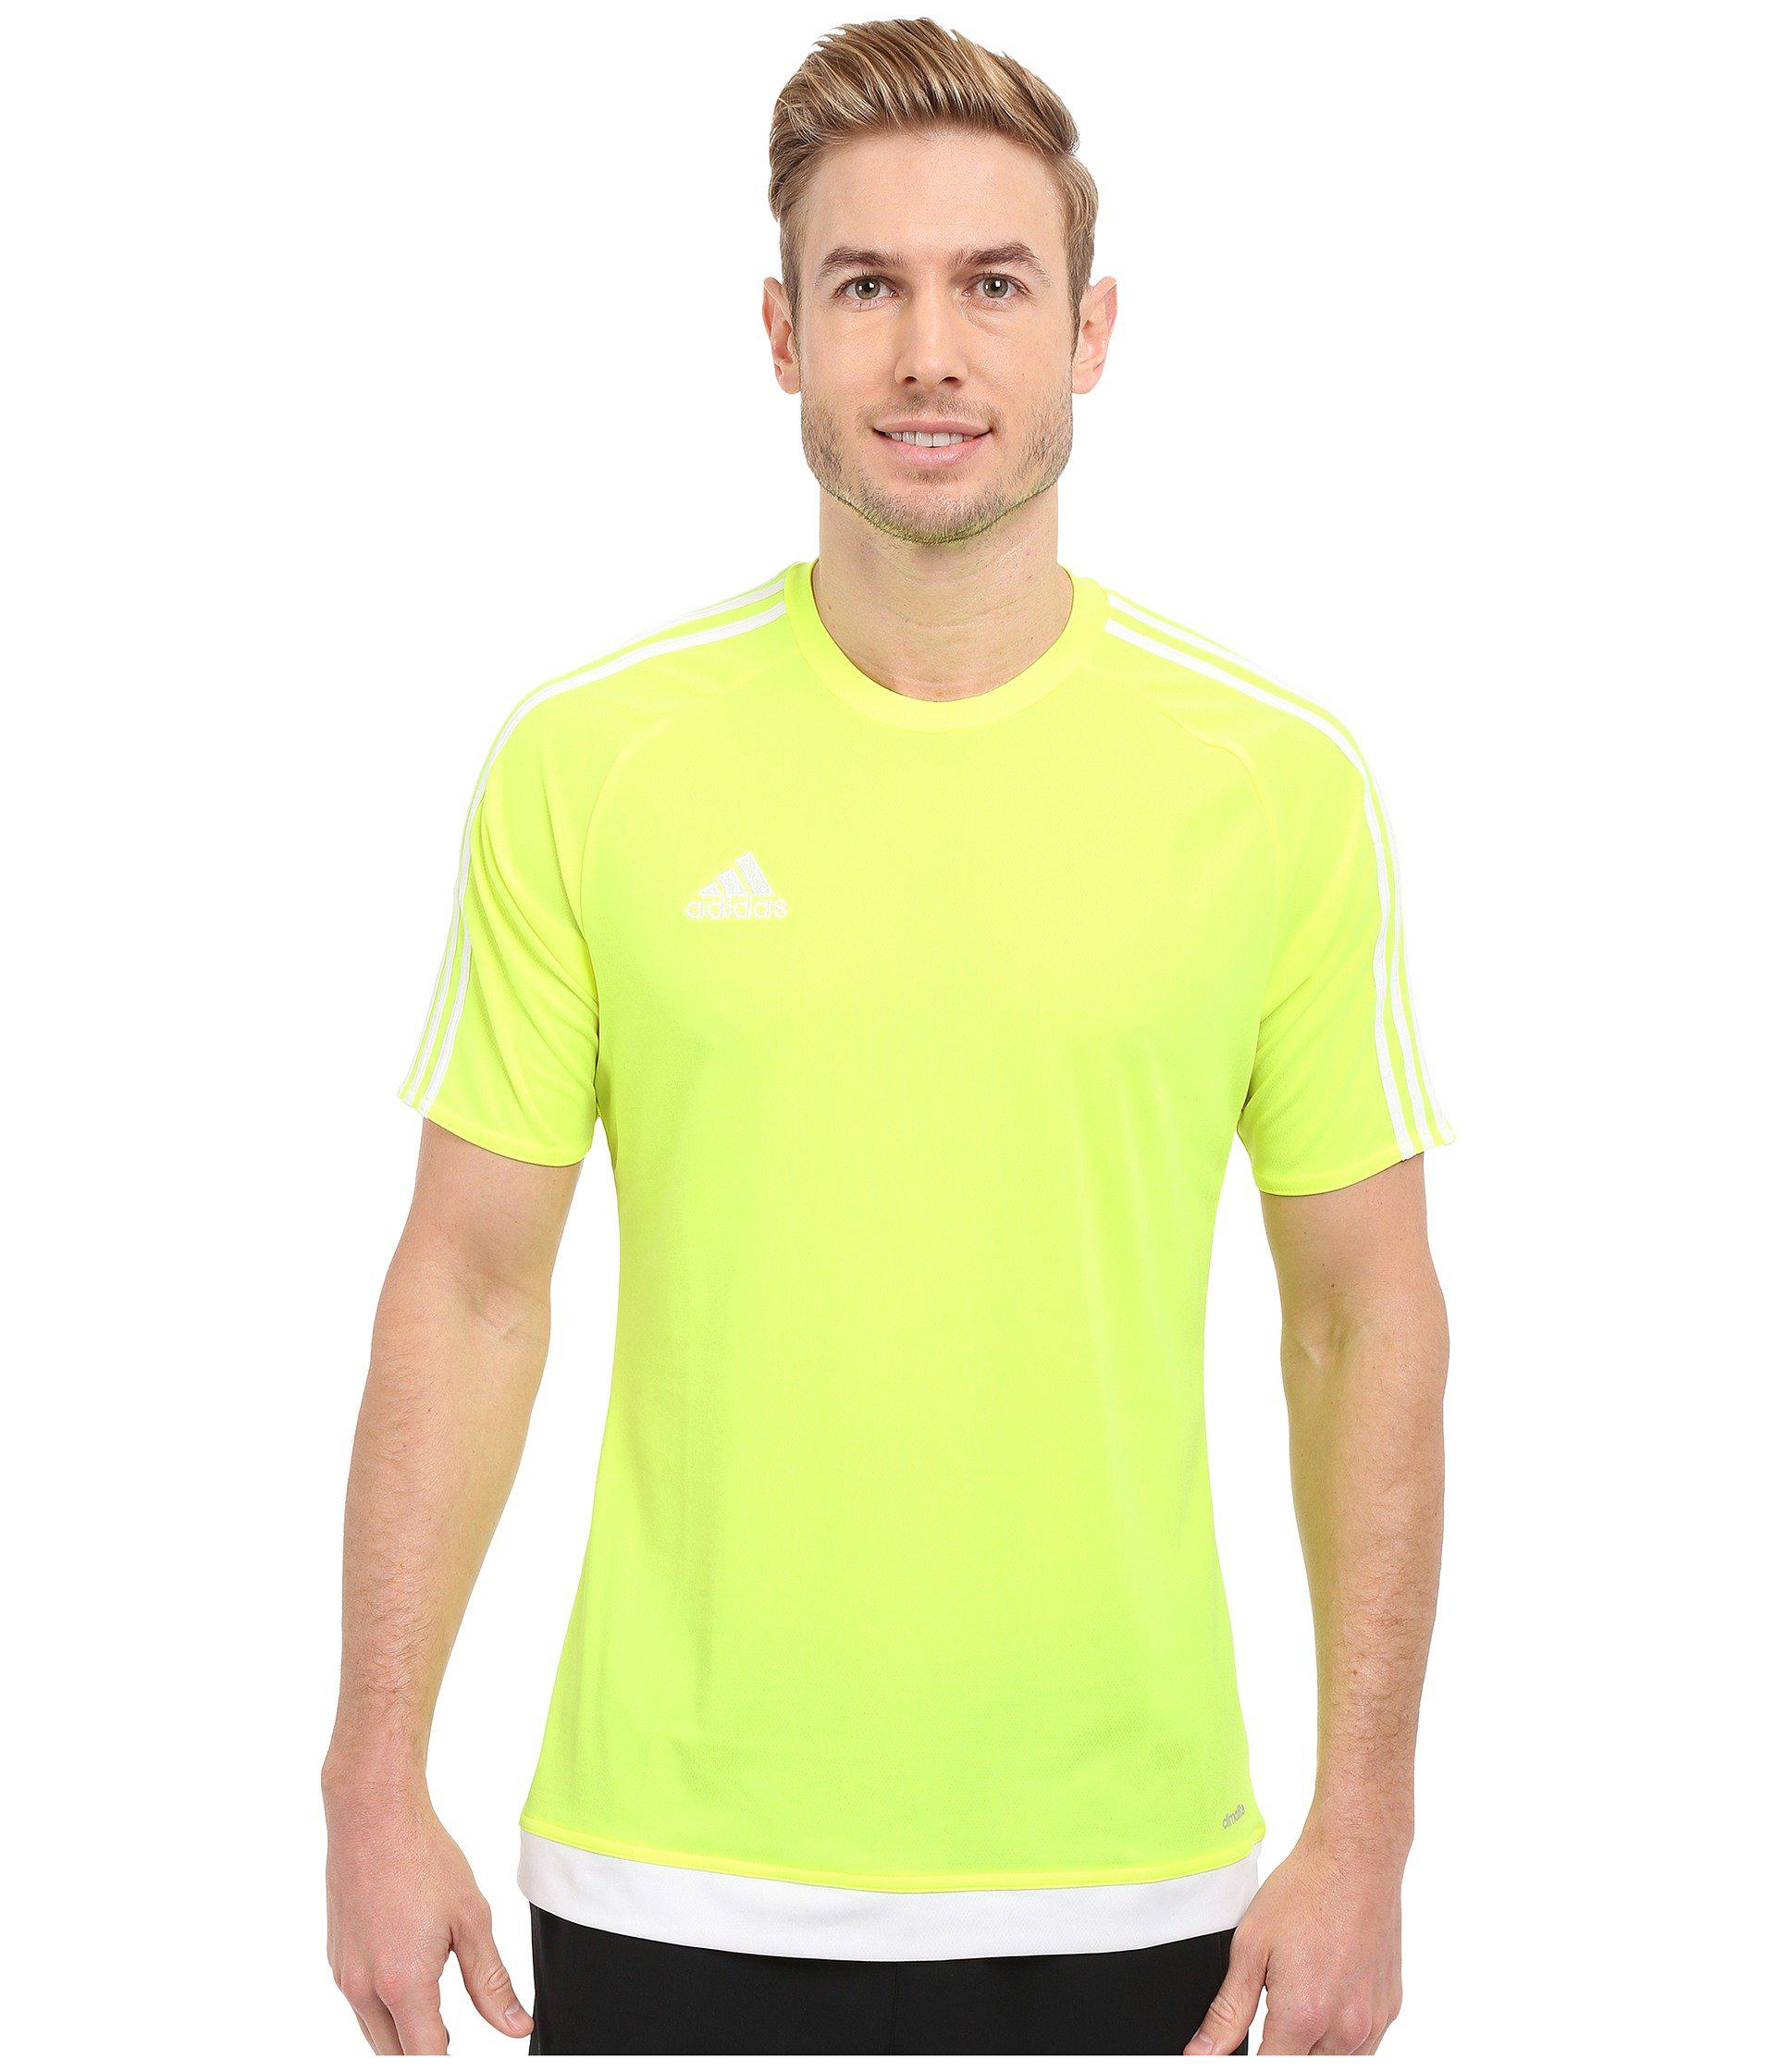 5fe0fca9434 Lyst - adidas Estro 15 Jersey in Yellow for Men